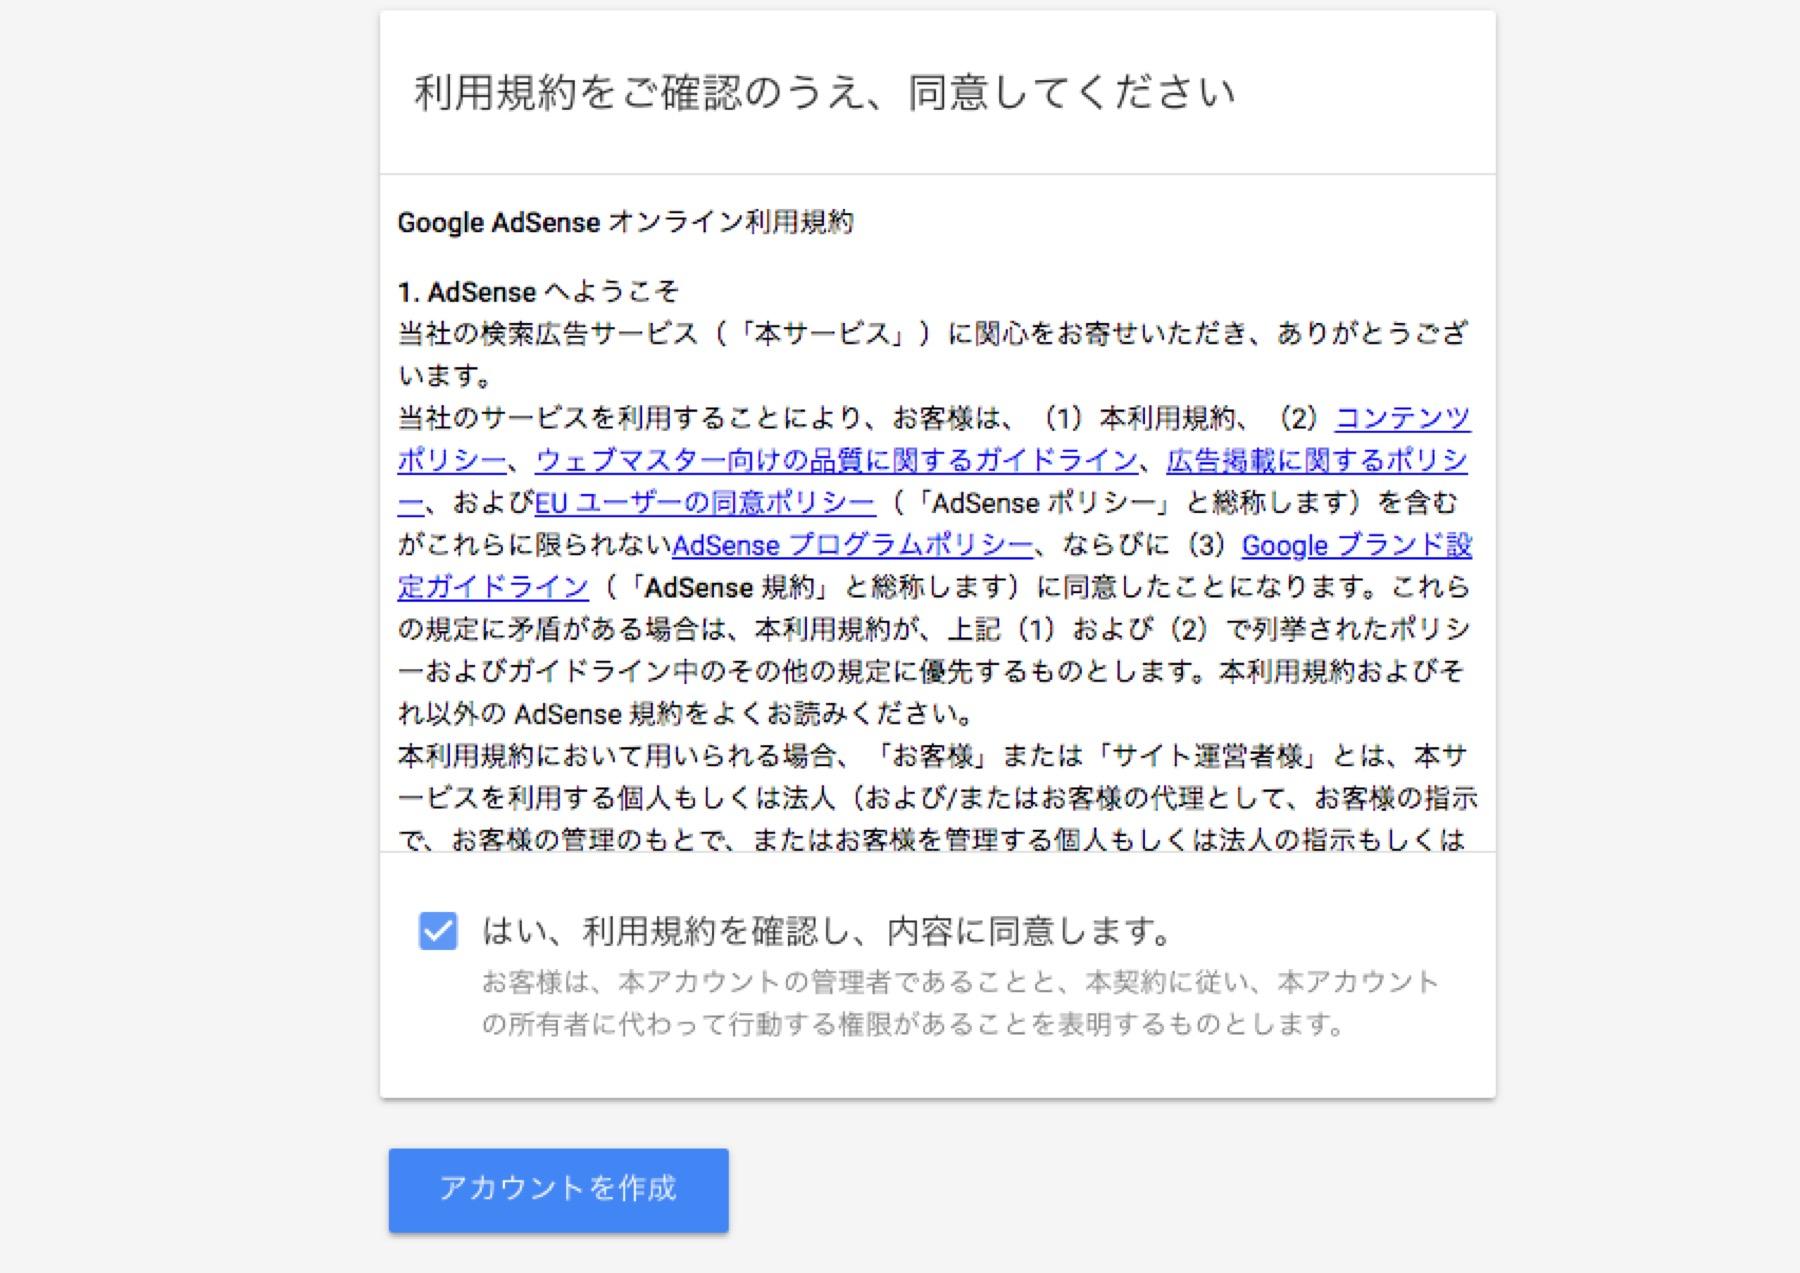 Google AdSenseの申請フォーム